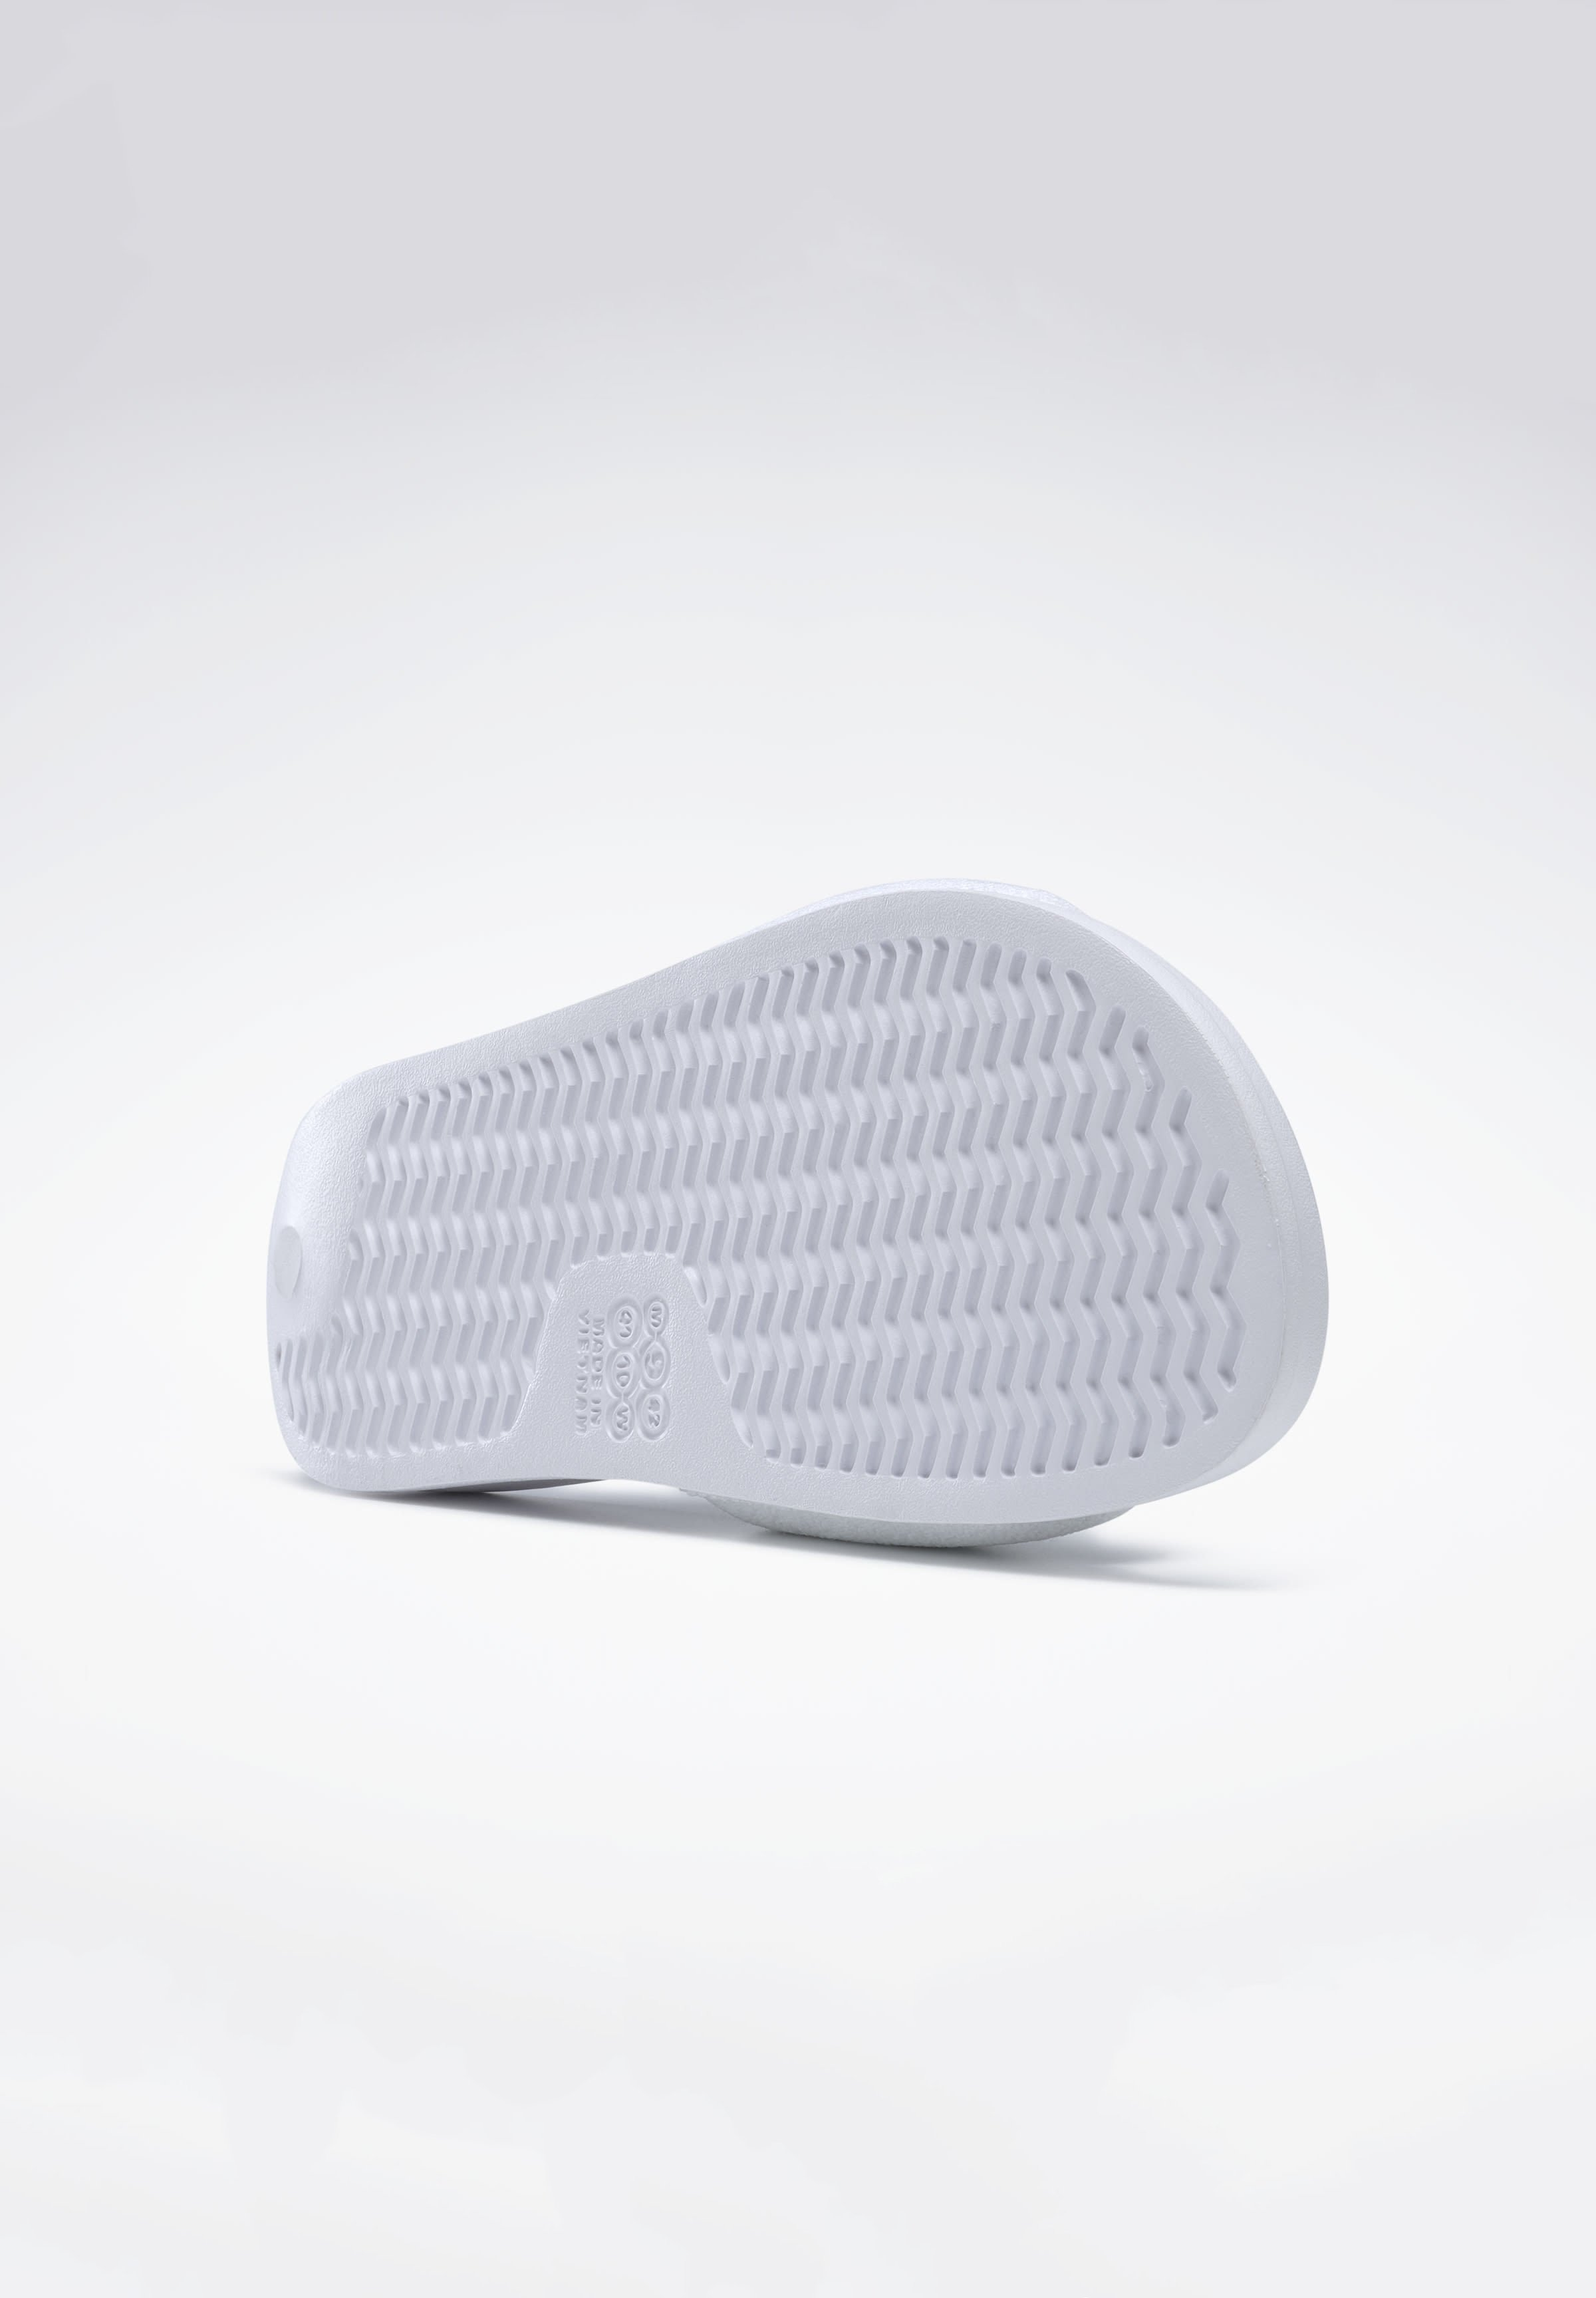 Scarpe da donna Reebok Classic REEBOK CLASSIC SLIDES Infradito da bagno white